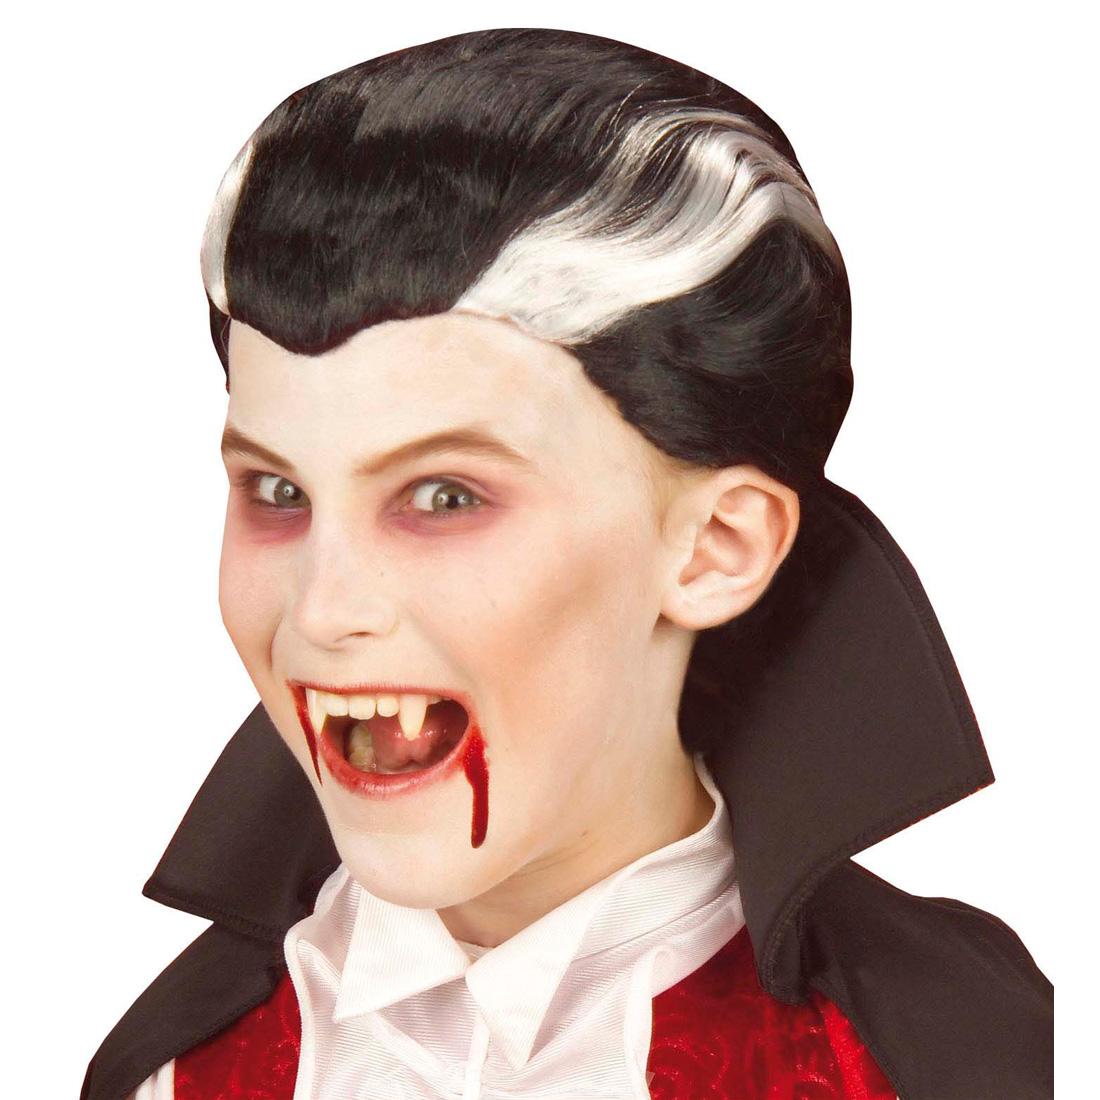 kinder vampir per cke dracula halloween vampirper cke. Black Bedroom Furniture Sets. Home Design Ideas